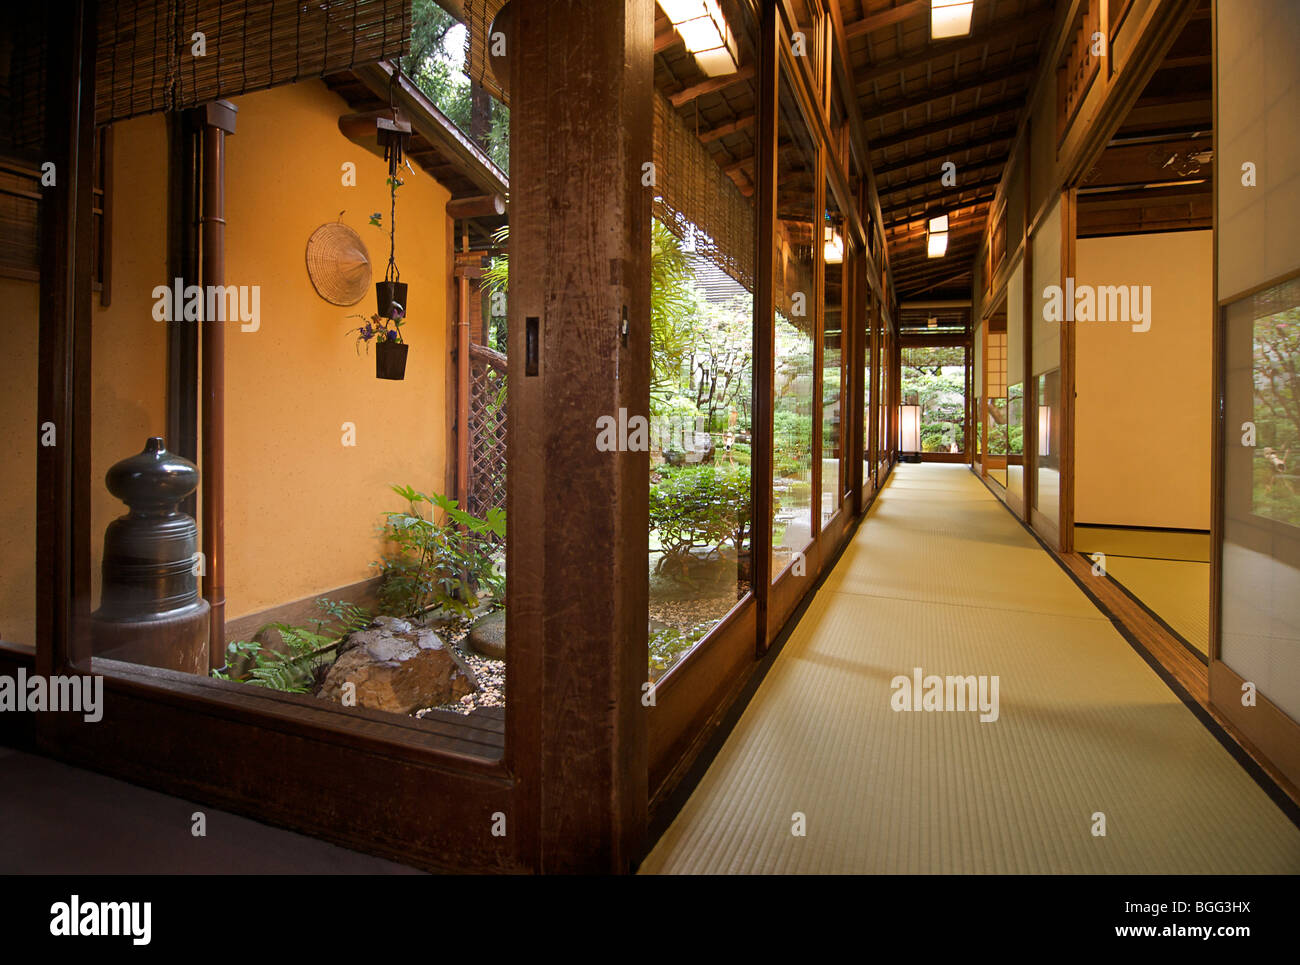 Yoshikawa ryokan. Traditional Japanese style guest house. Kyoto, Japan - Stock Image